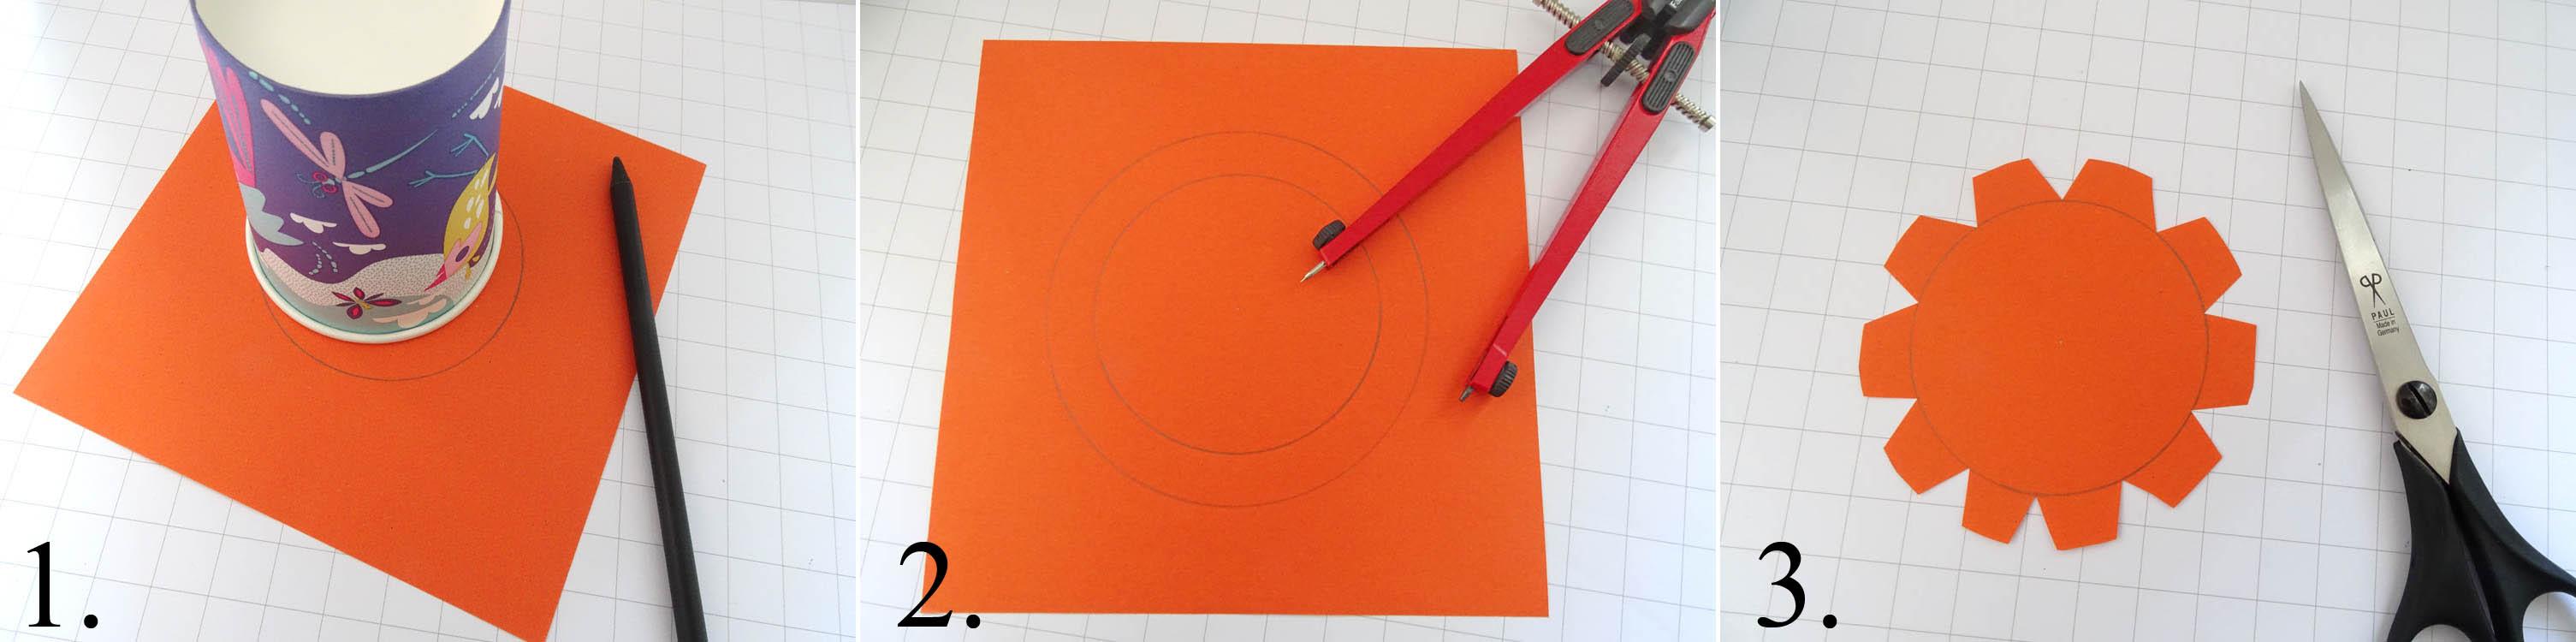 DIY Idee Mini Pinata Anleitung 1-3